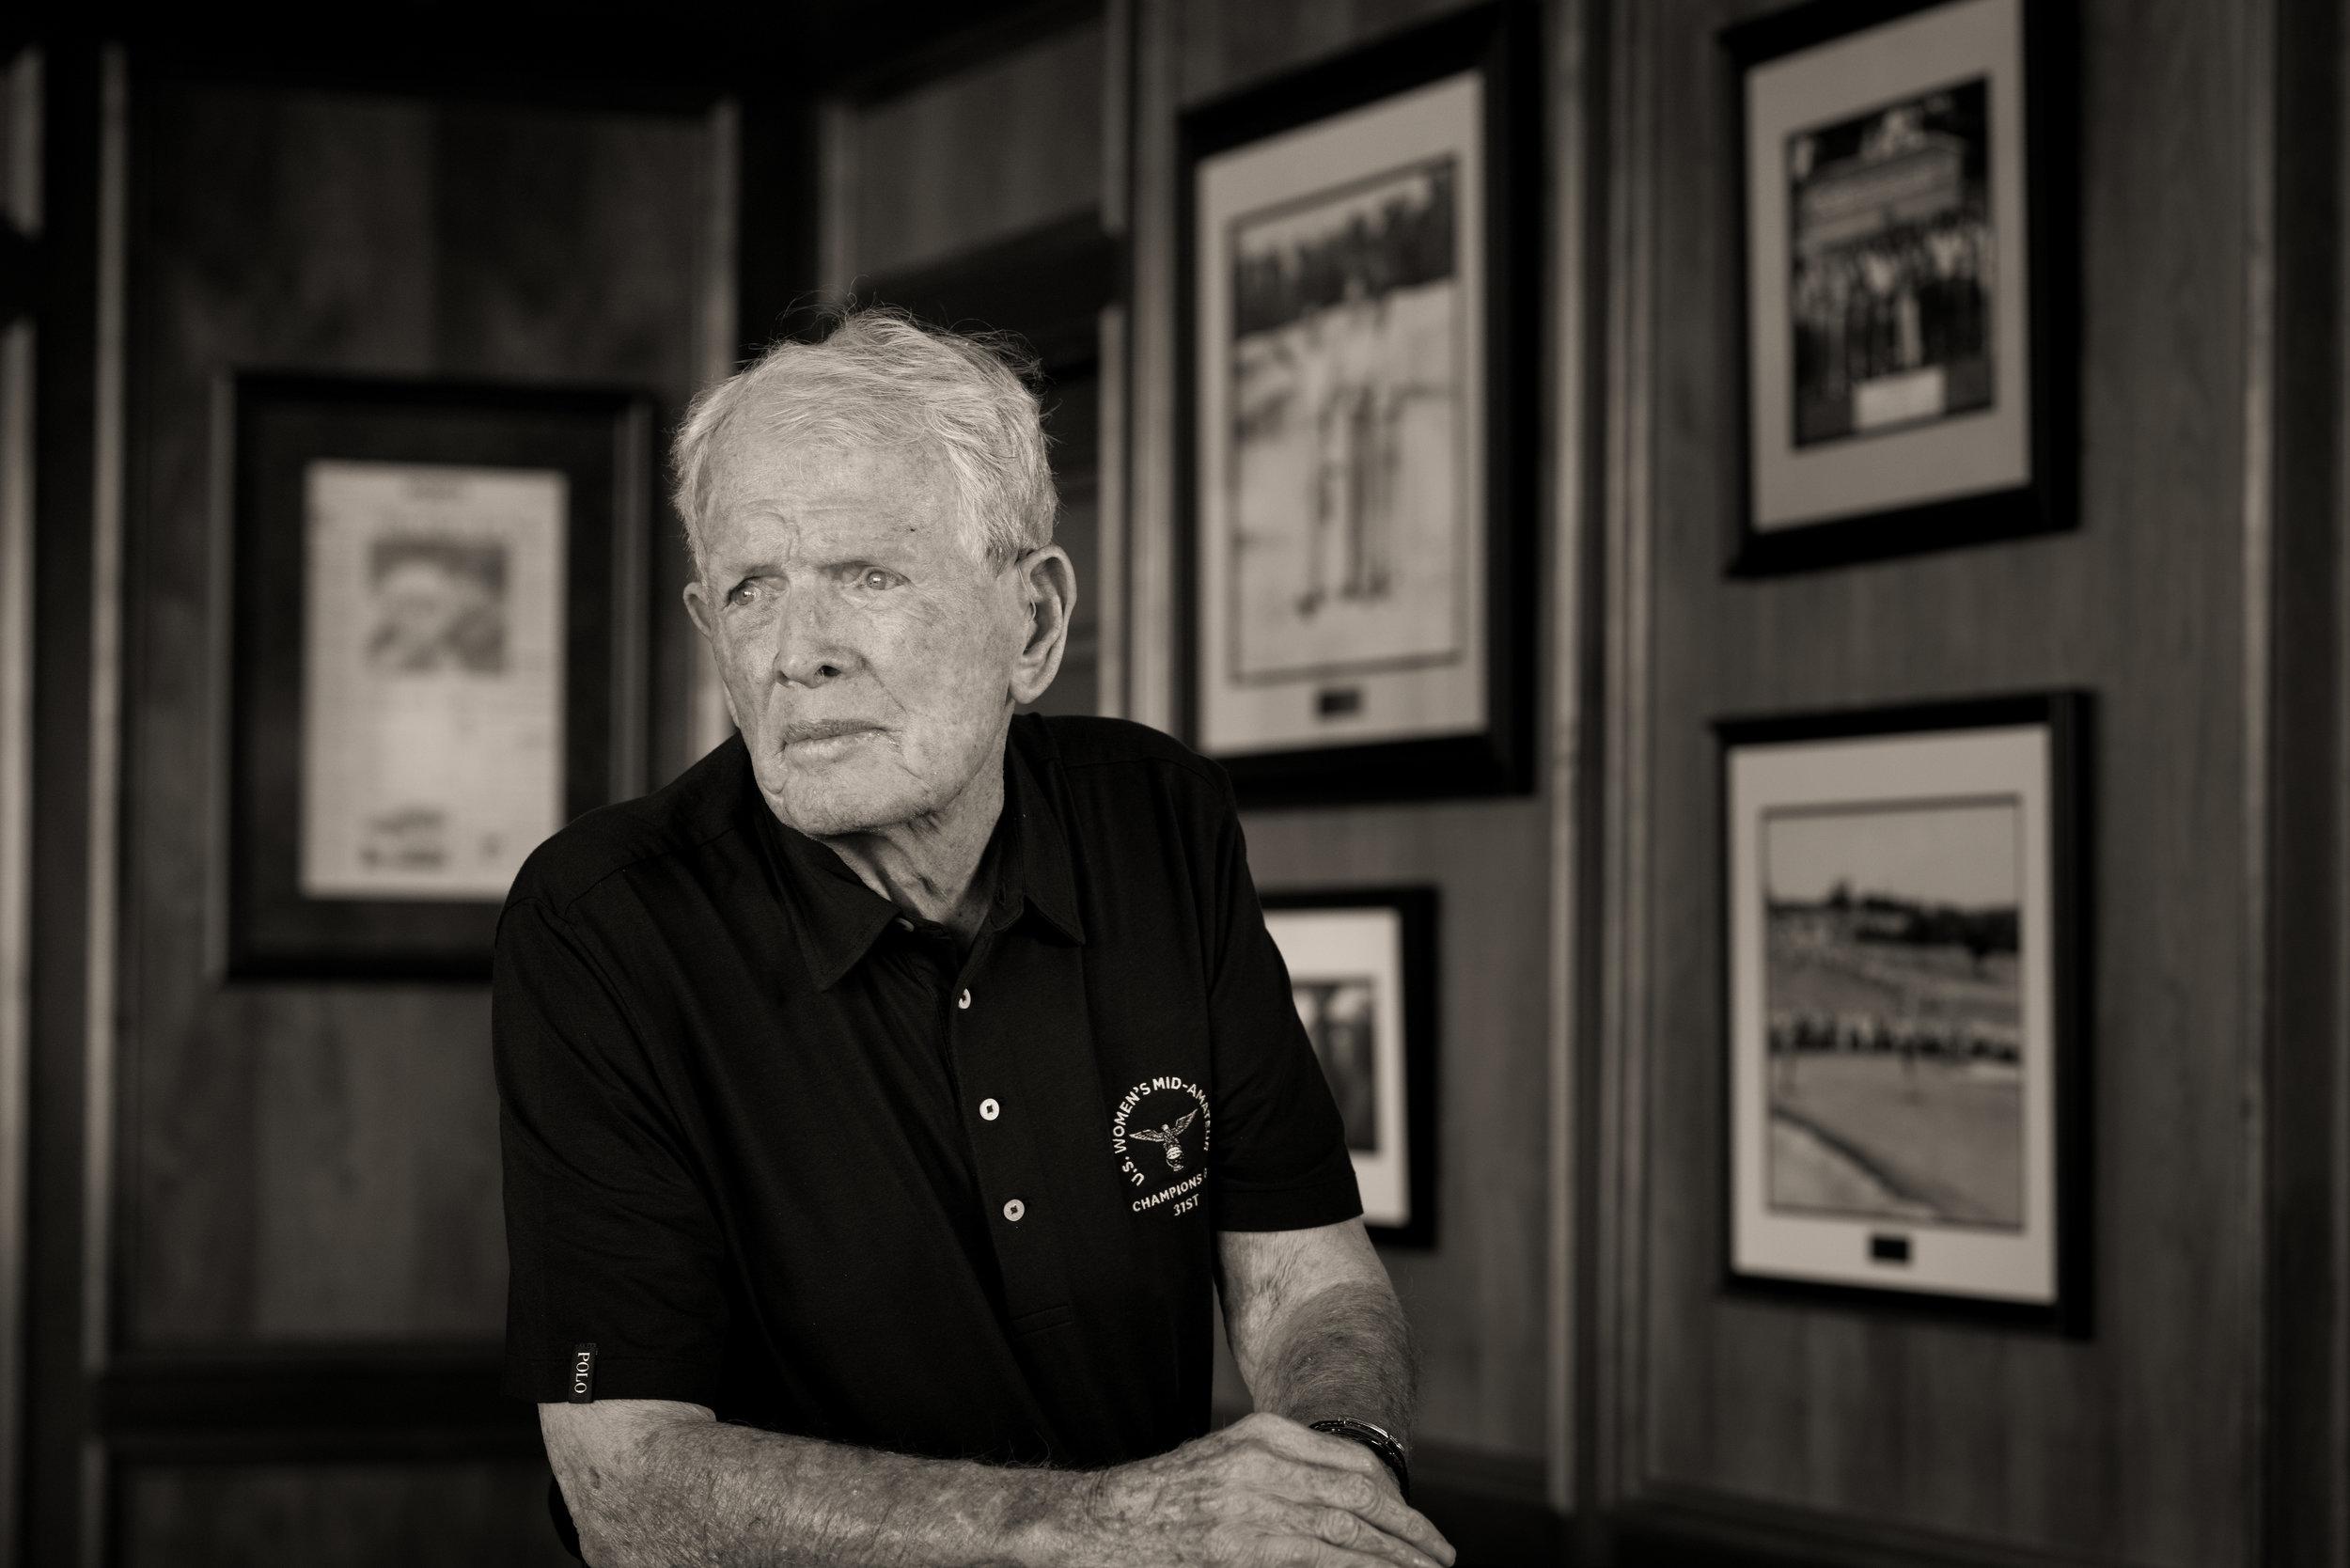 Jack Burke, Jr., 1956 Masters Champion. Champions GC, Houston, Texas. Sony A7rii, Leica M 75mm f1.4 Summilux